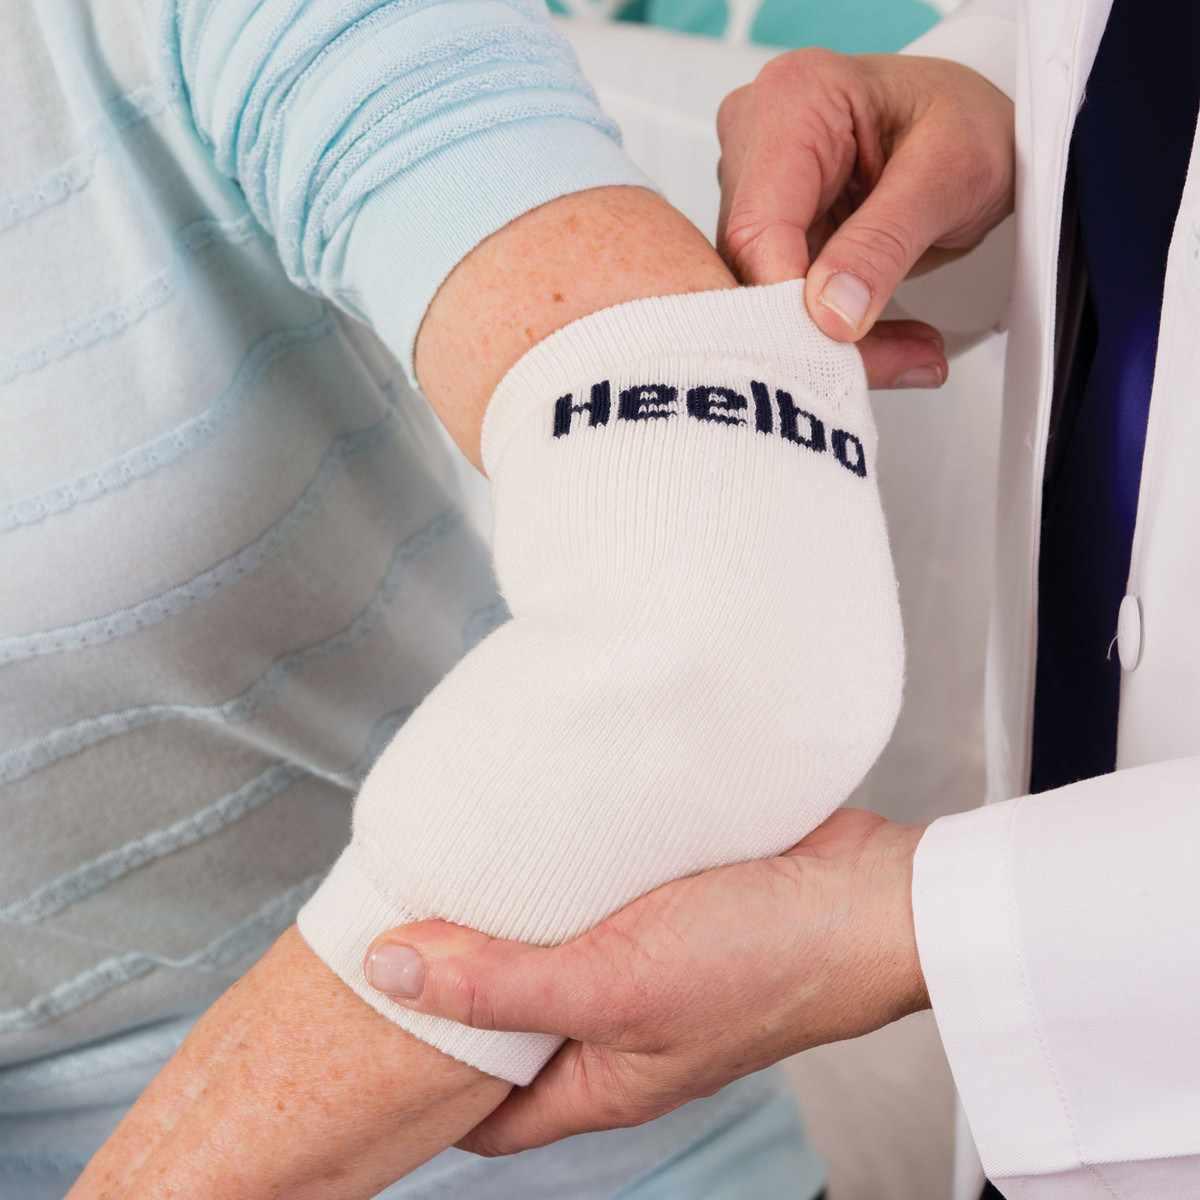 Heelbo Heel and Elbow Protector